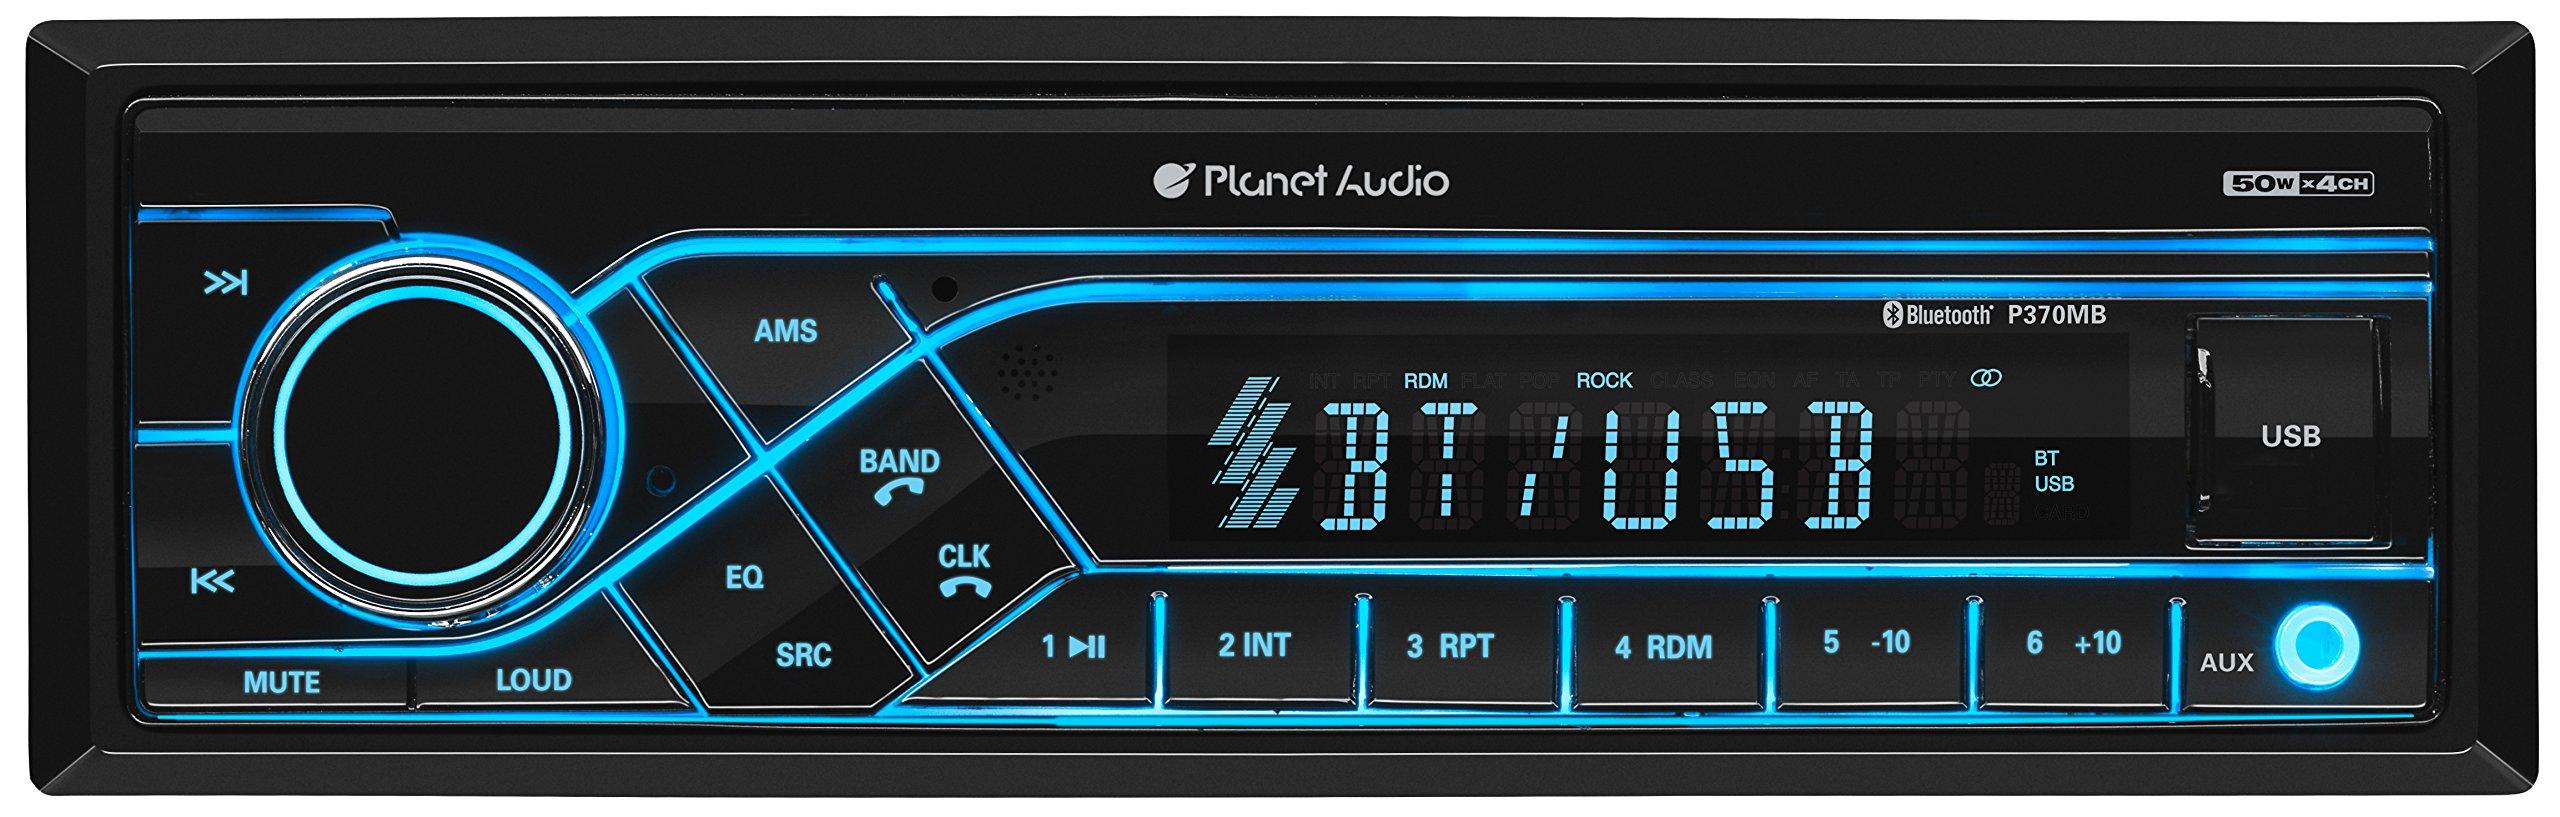 Planet Audio P370MB Car Receiver - Bluetooth / MP3 / USB, AM/FM Radio, (No CD/DVD)